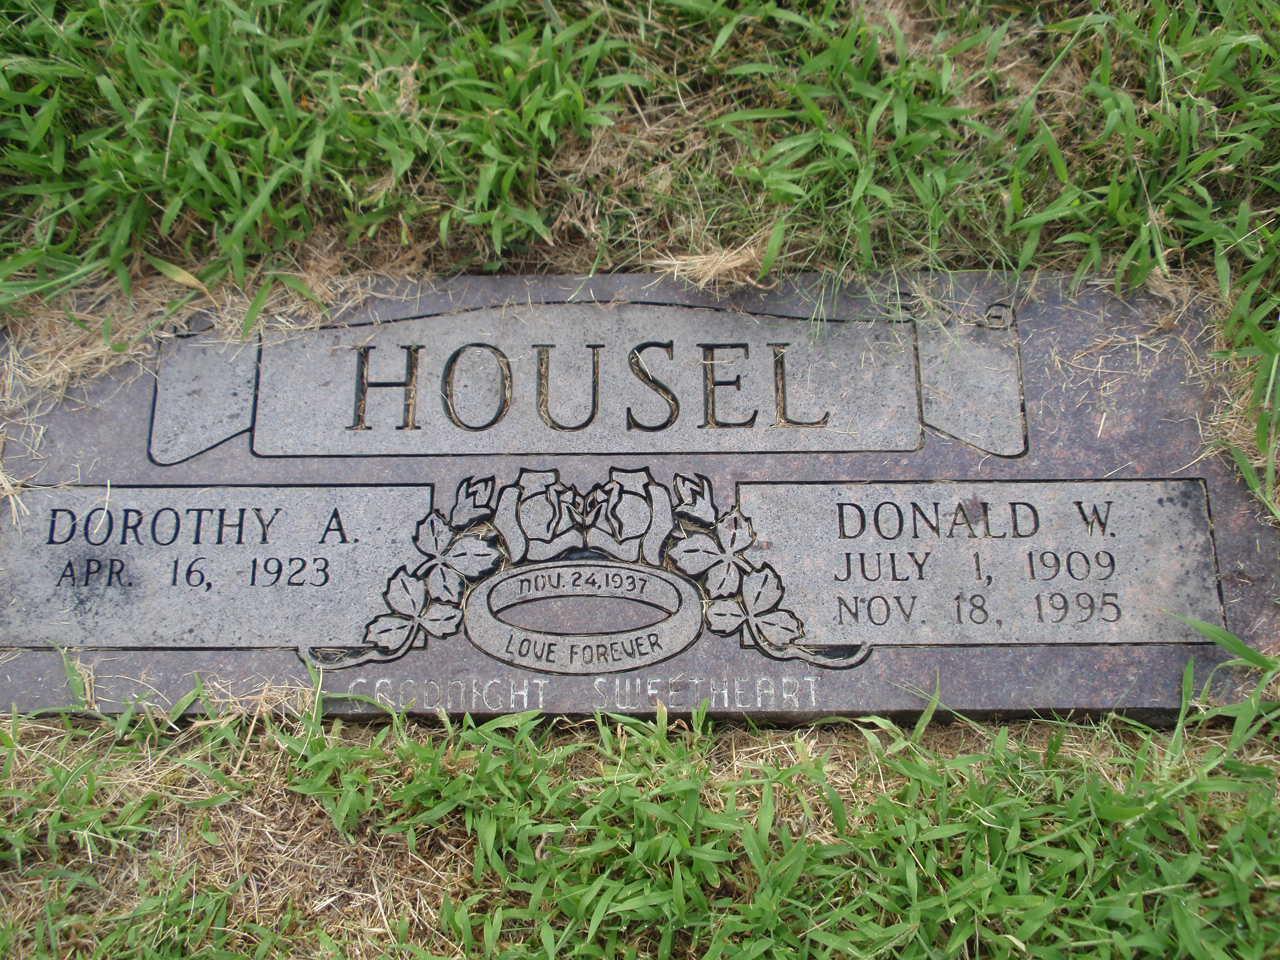 Donald Willis Housel